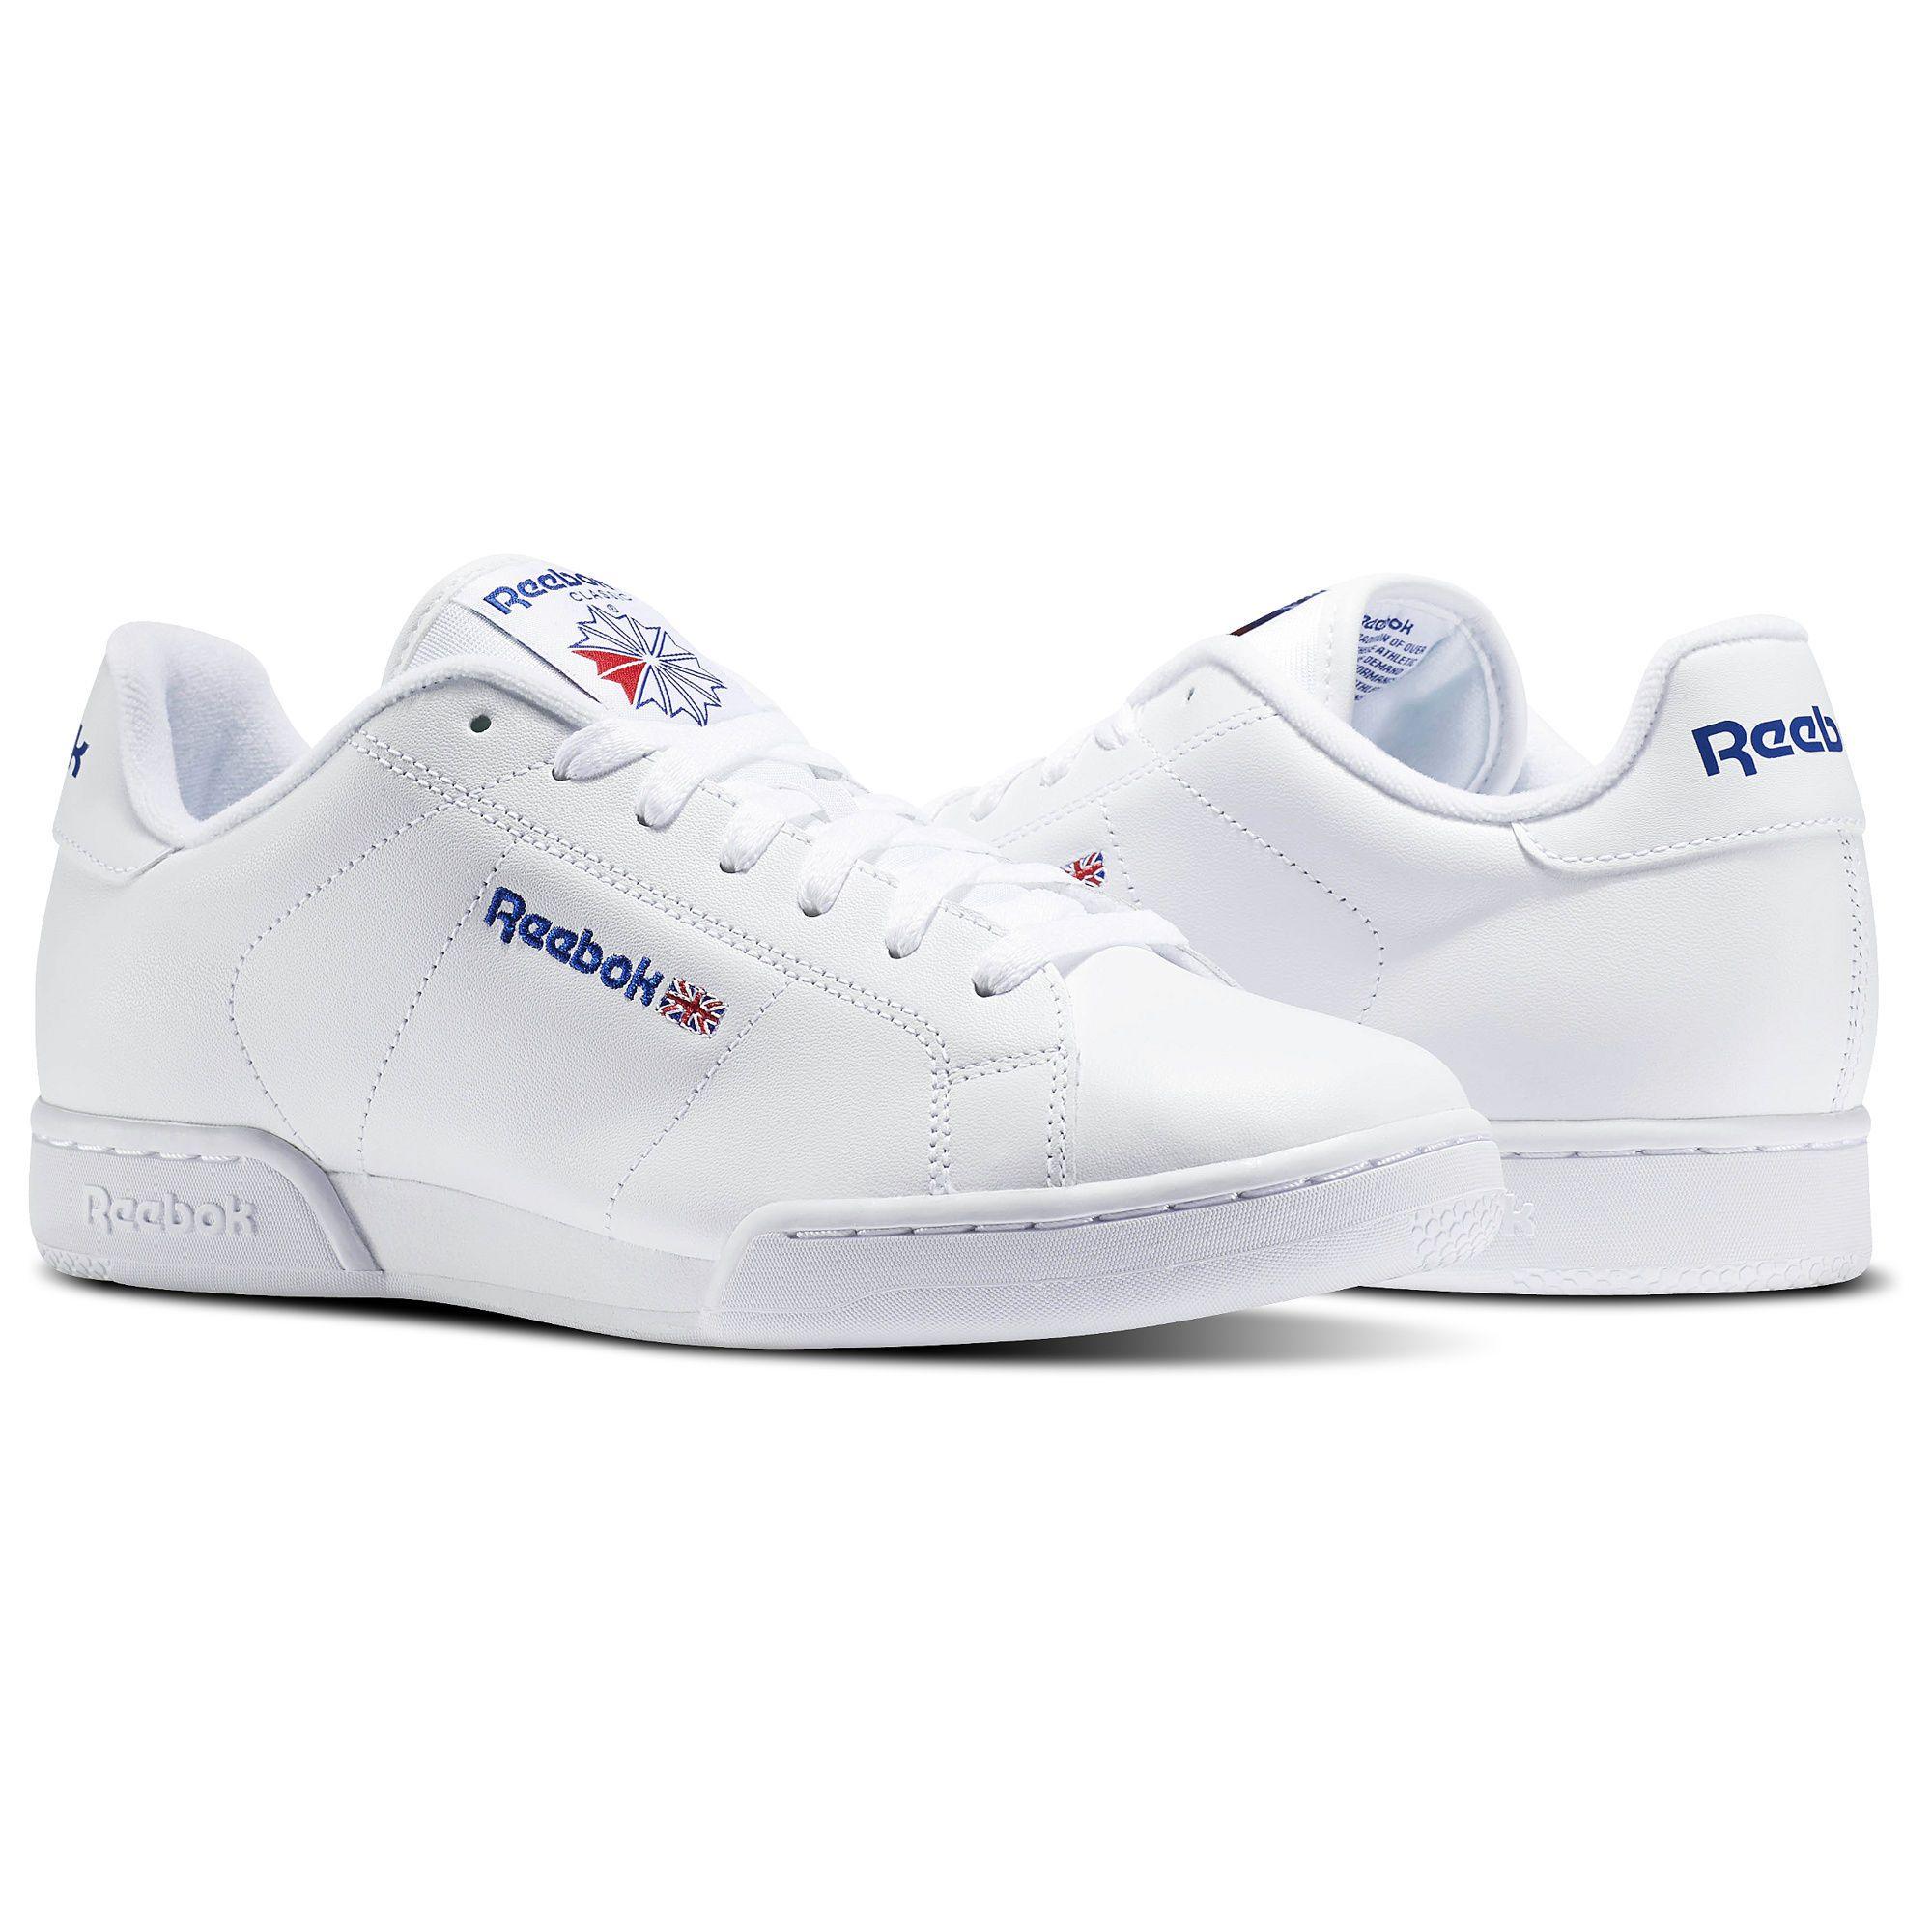 Reebok Classics NPC II (WhiteWhite) Men's Shoes 1354